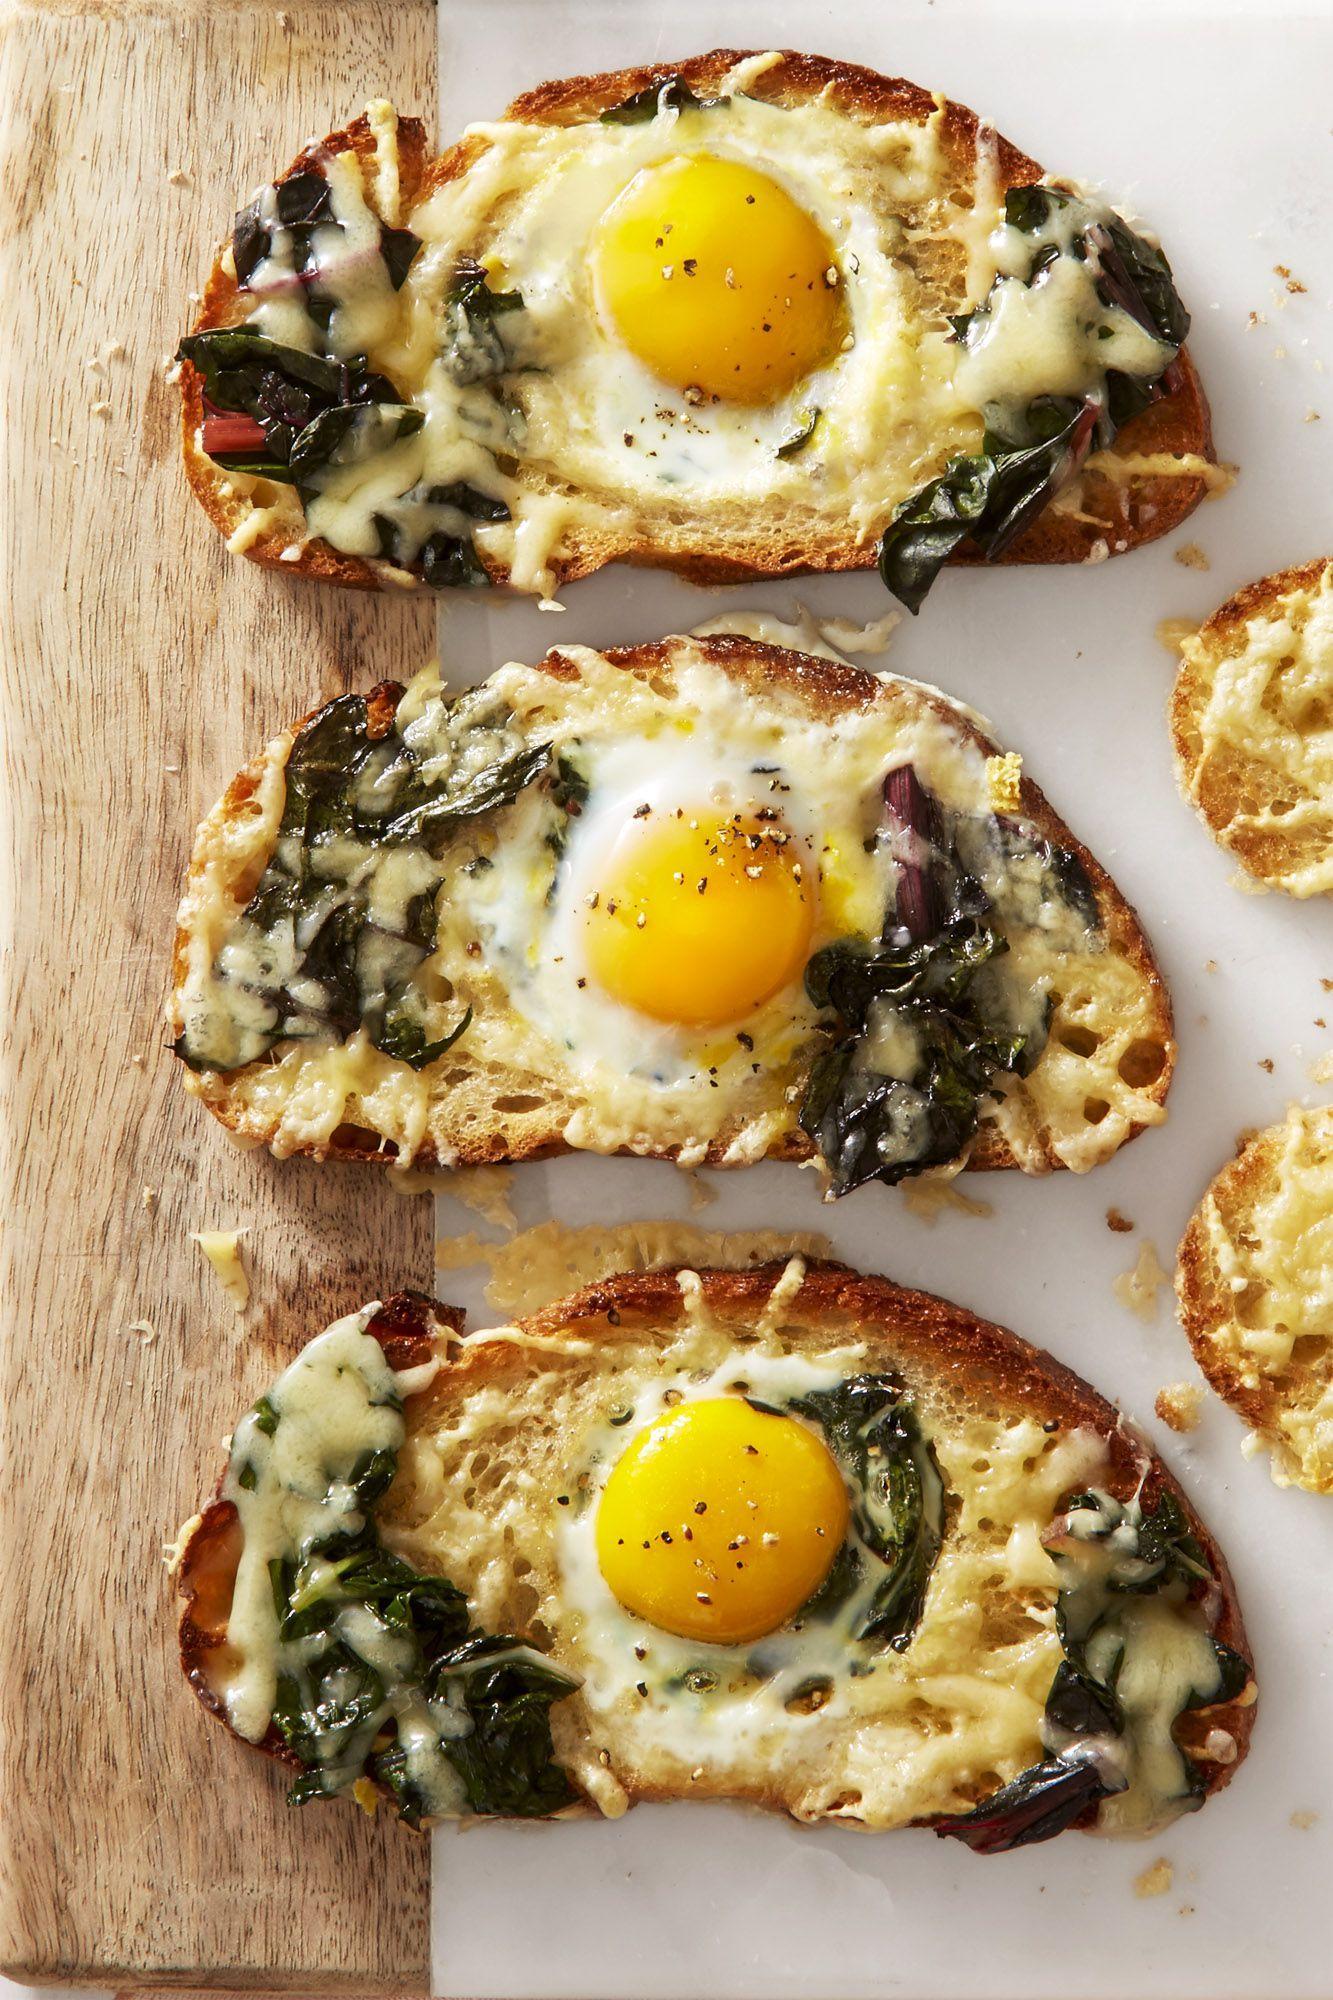 Egg Recipes - goldbreakfast.com